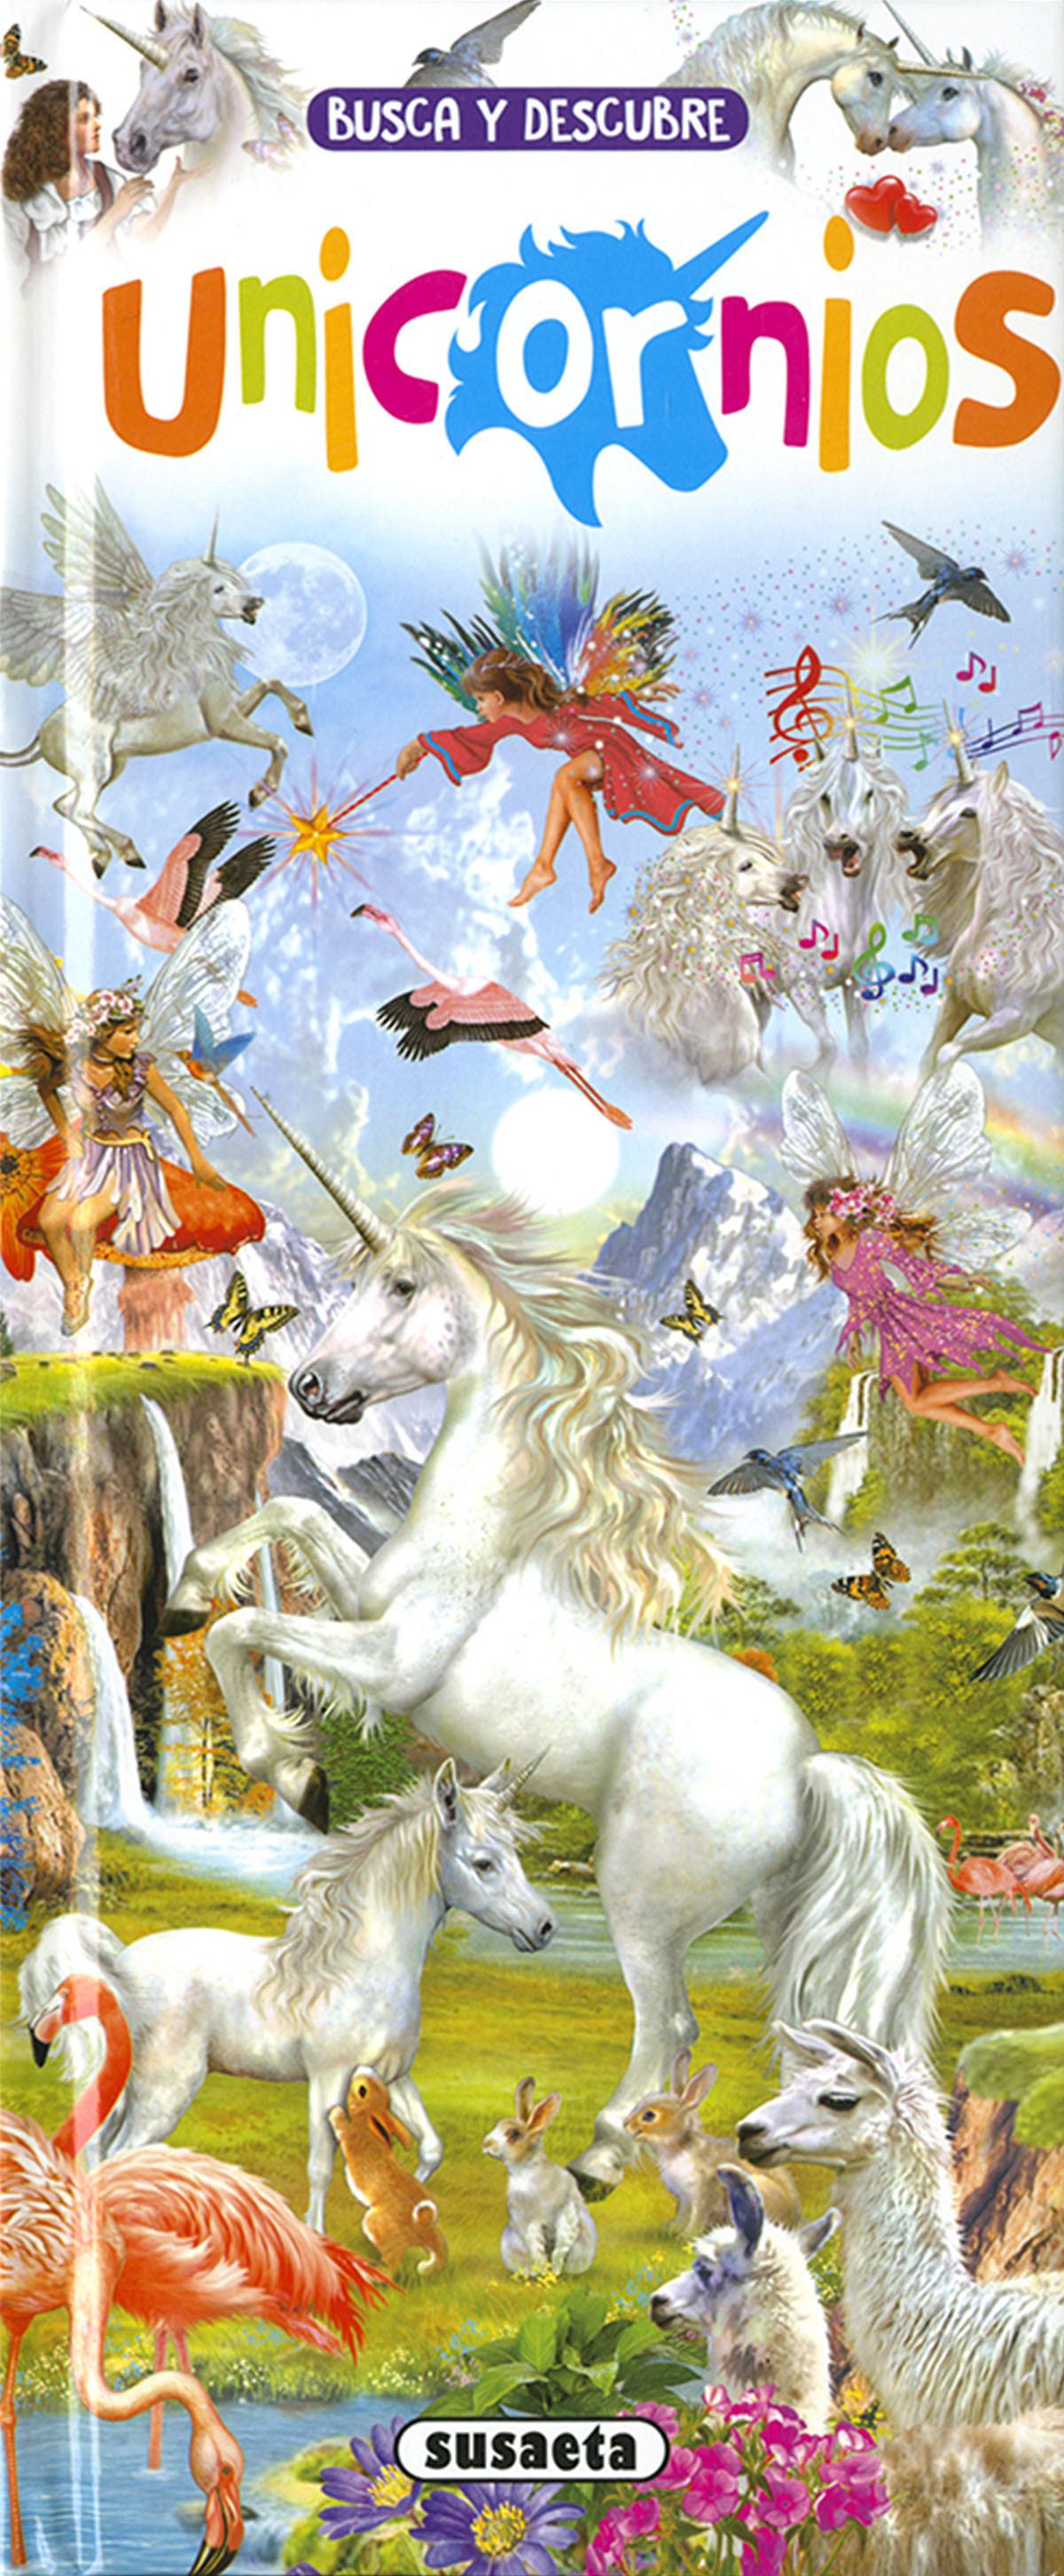 Busca y descubre Unicornios 9788467775457